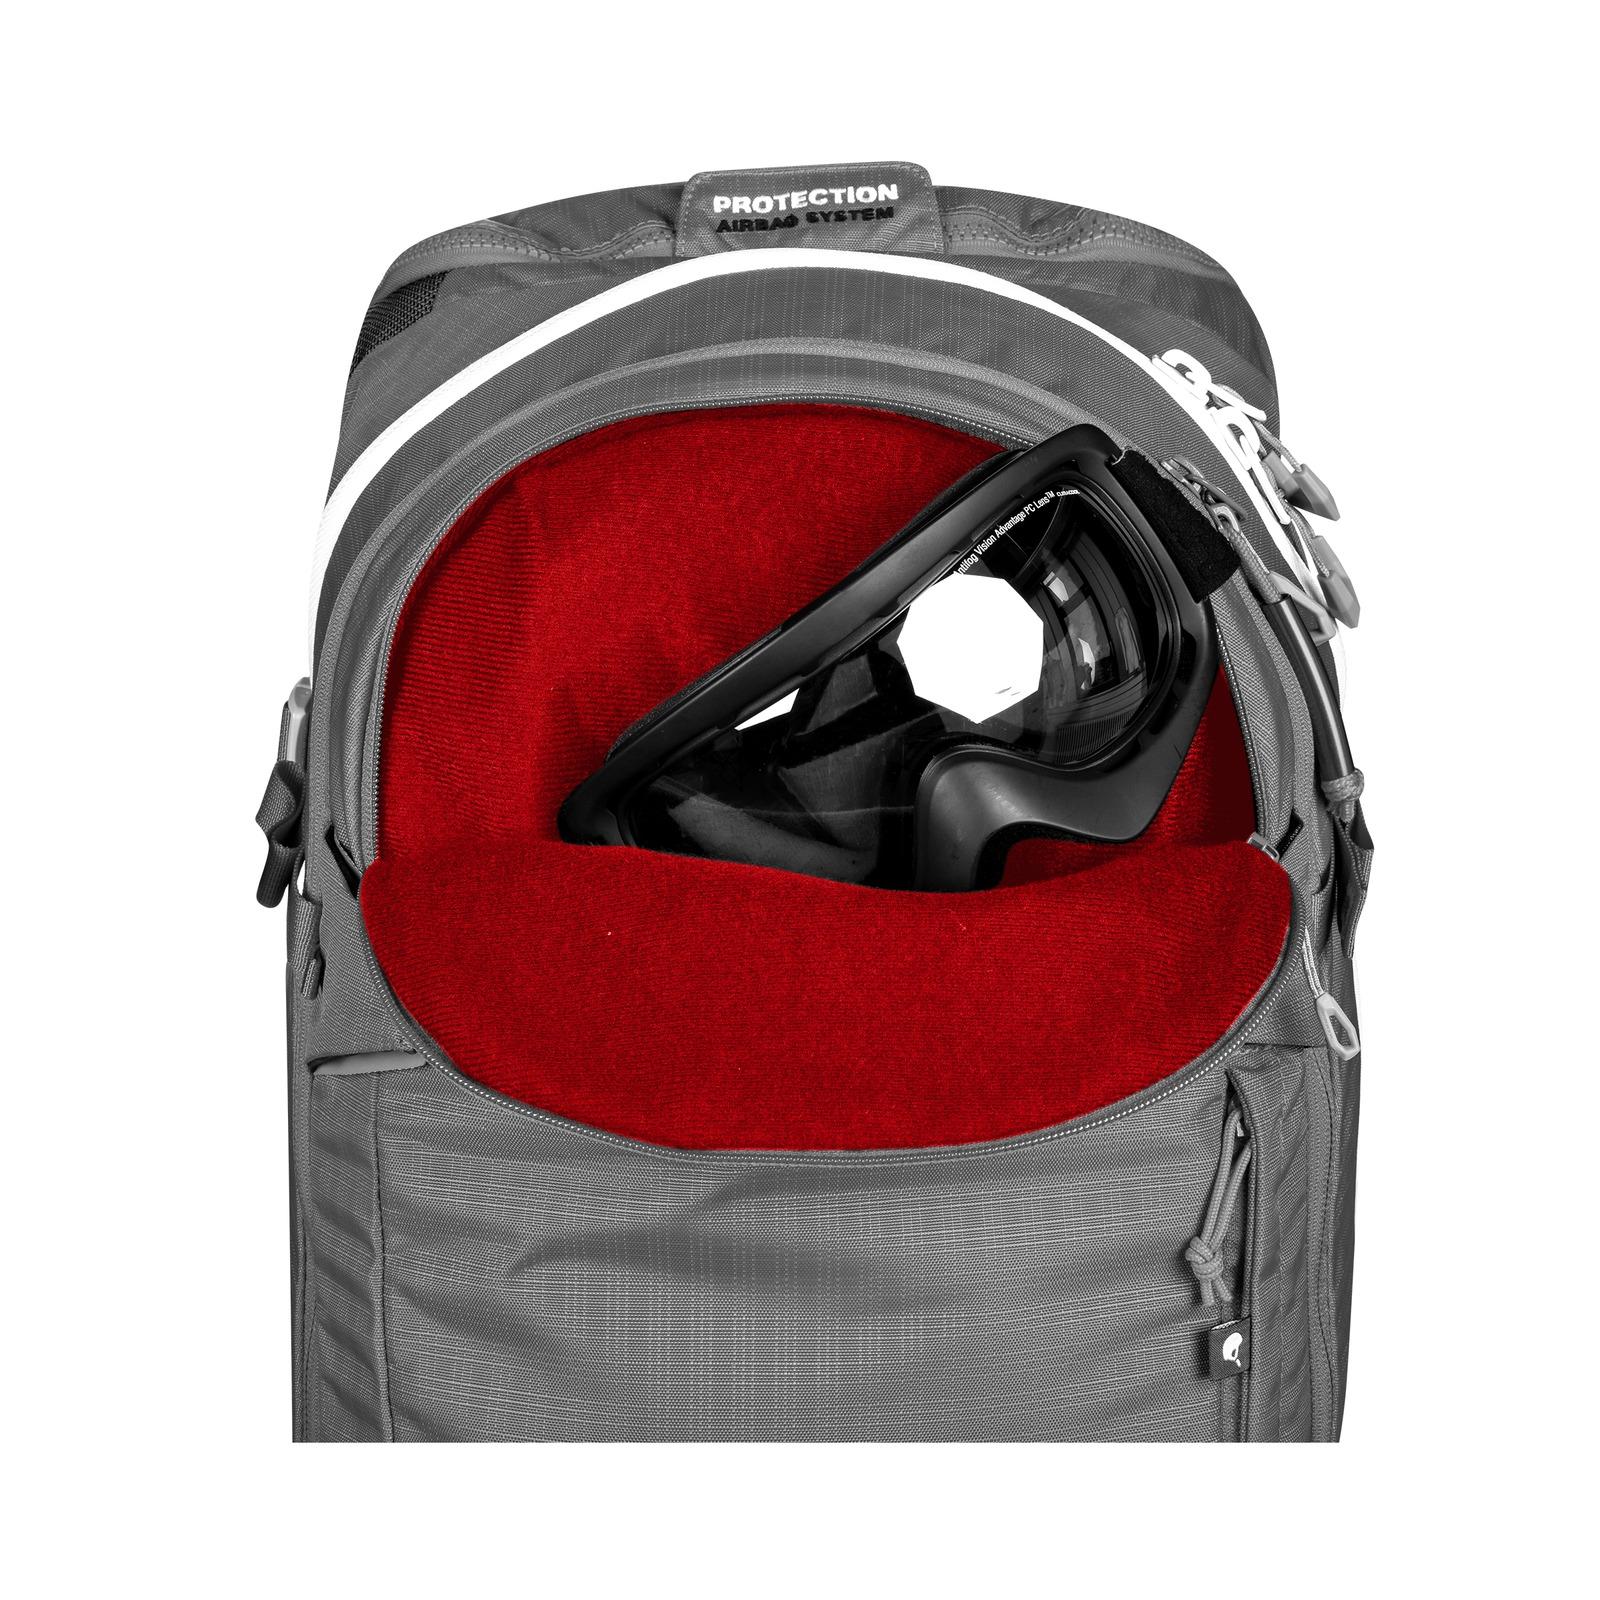 ride-protection-airbag-3-0-7_neutral_det_rgb_1600x1600.jpg